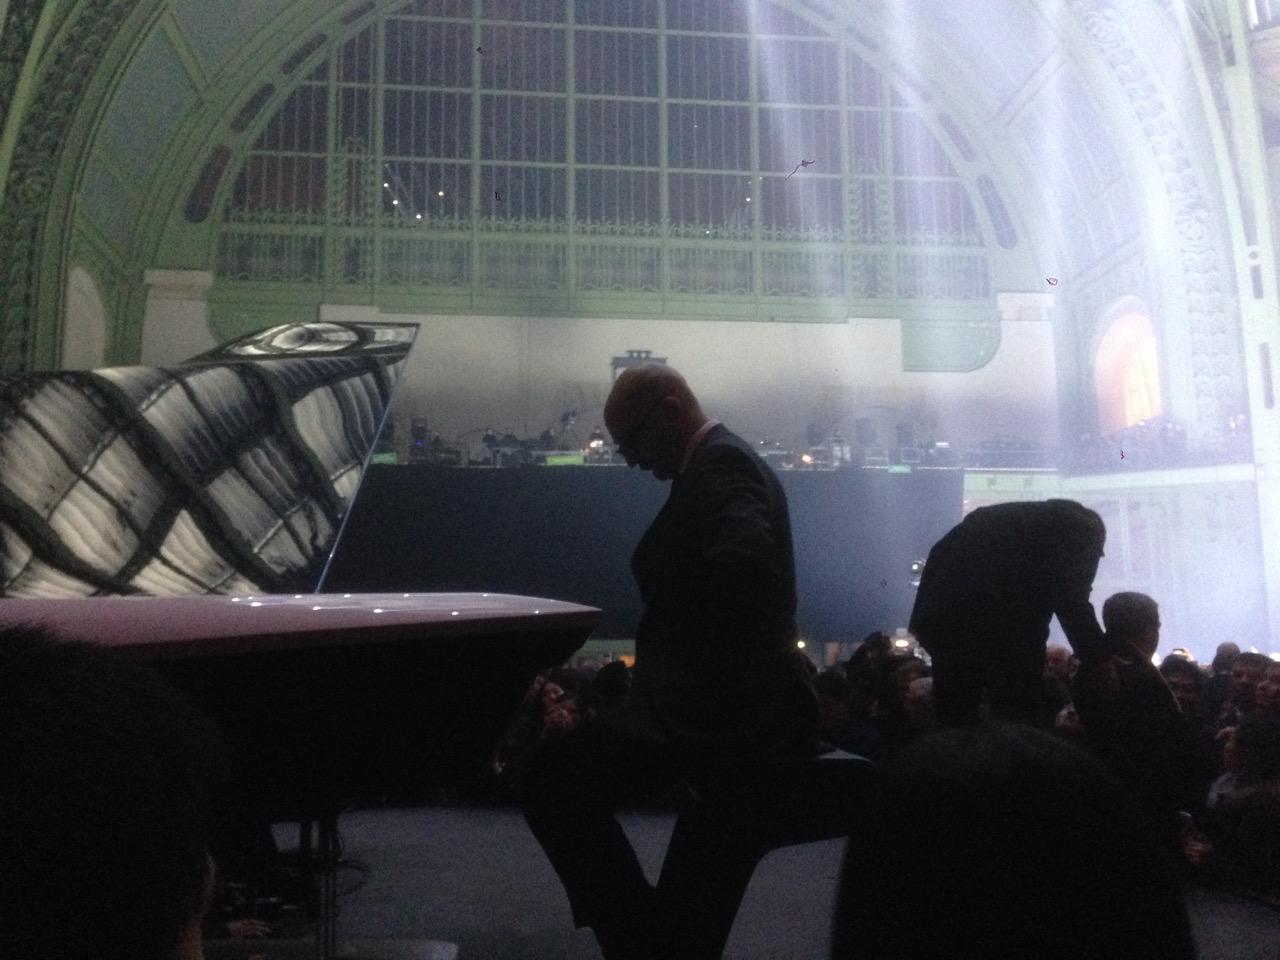 HSS at Nuit De Chine at Le Grand Palais 2014